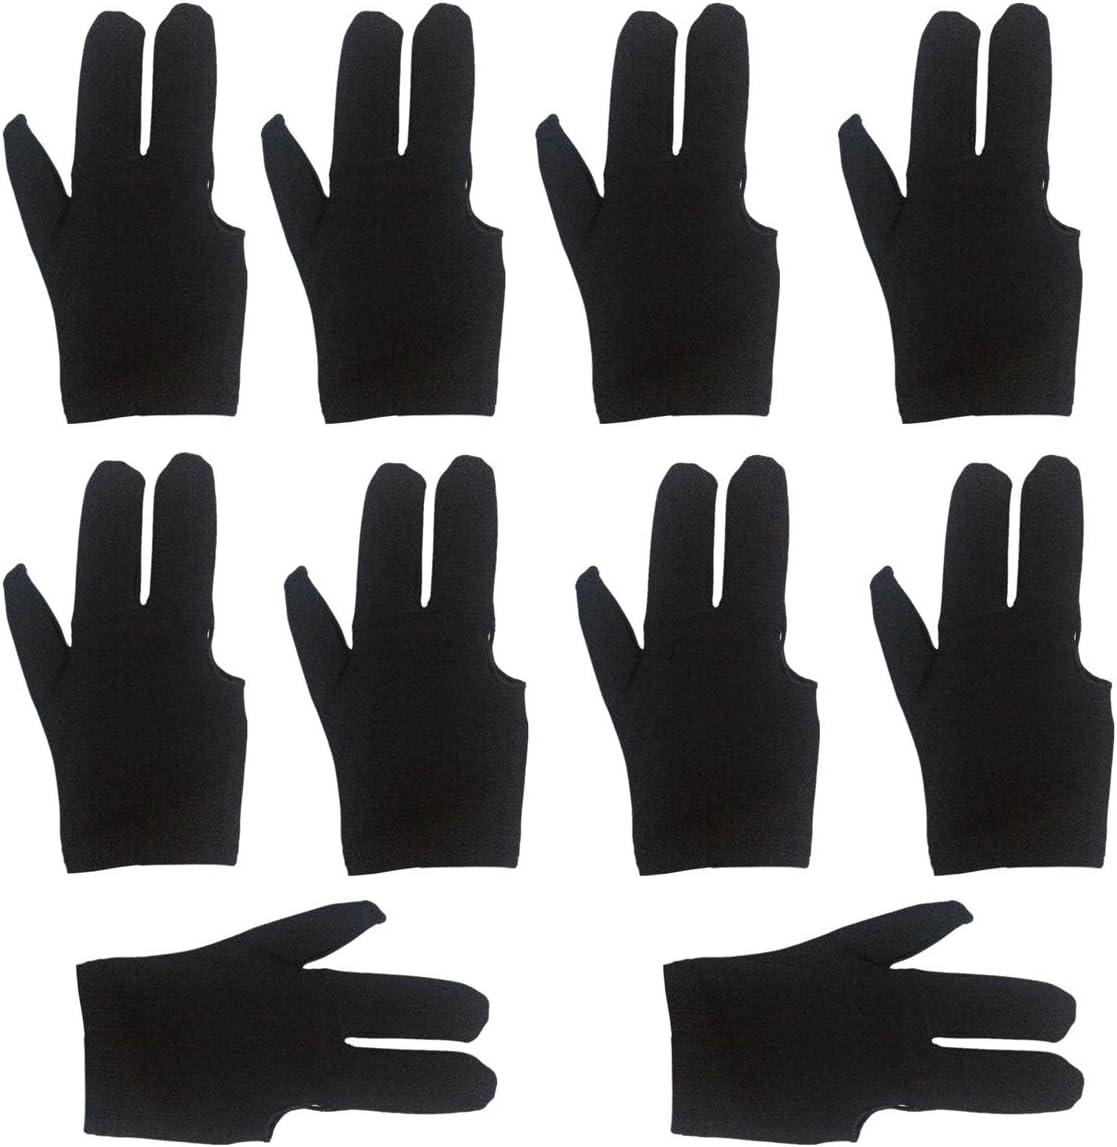 Black lasenersm 10 Pieces Billiard Gloves 3 Finger Billiard Gloves Pool Cue Gloves 3 Fingers Show Gloves Snooker Gloves Wear on The Right or Left Hand for Men Women